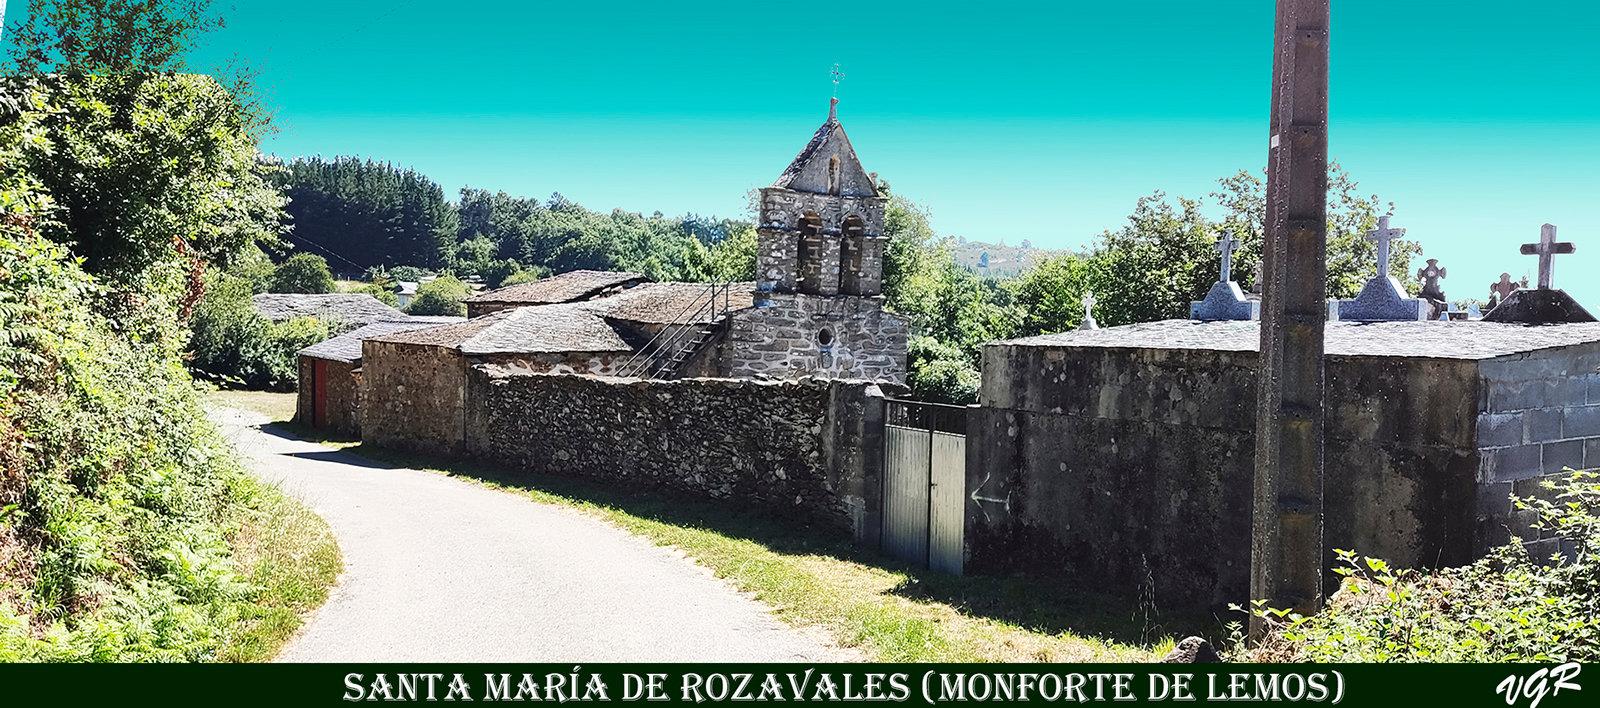 Santa Maria de Rozavales-1-REDUC-WEB.jpg